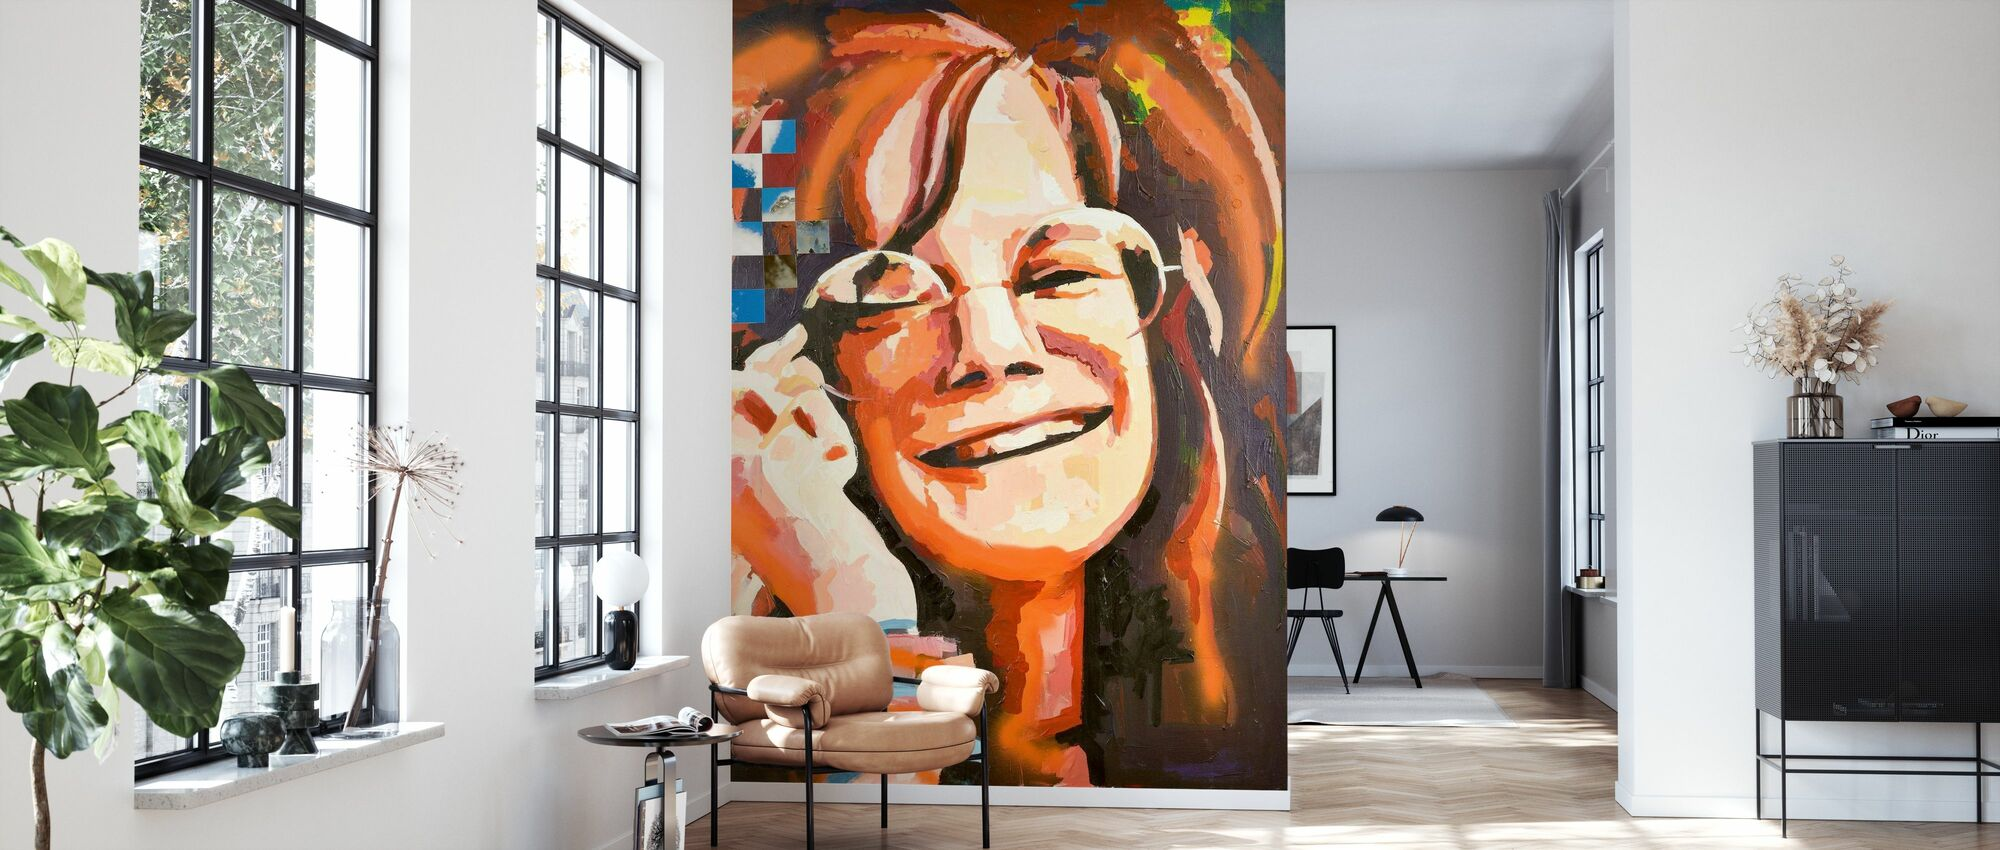 Fru Woodstock - Tapet - Stue